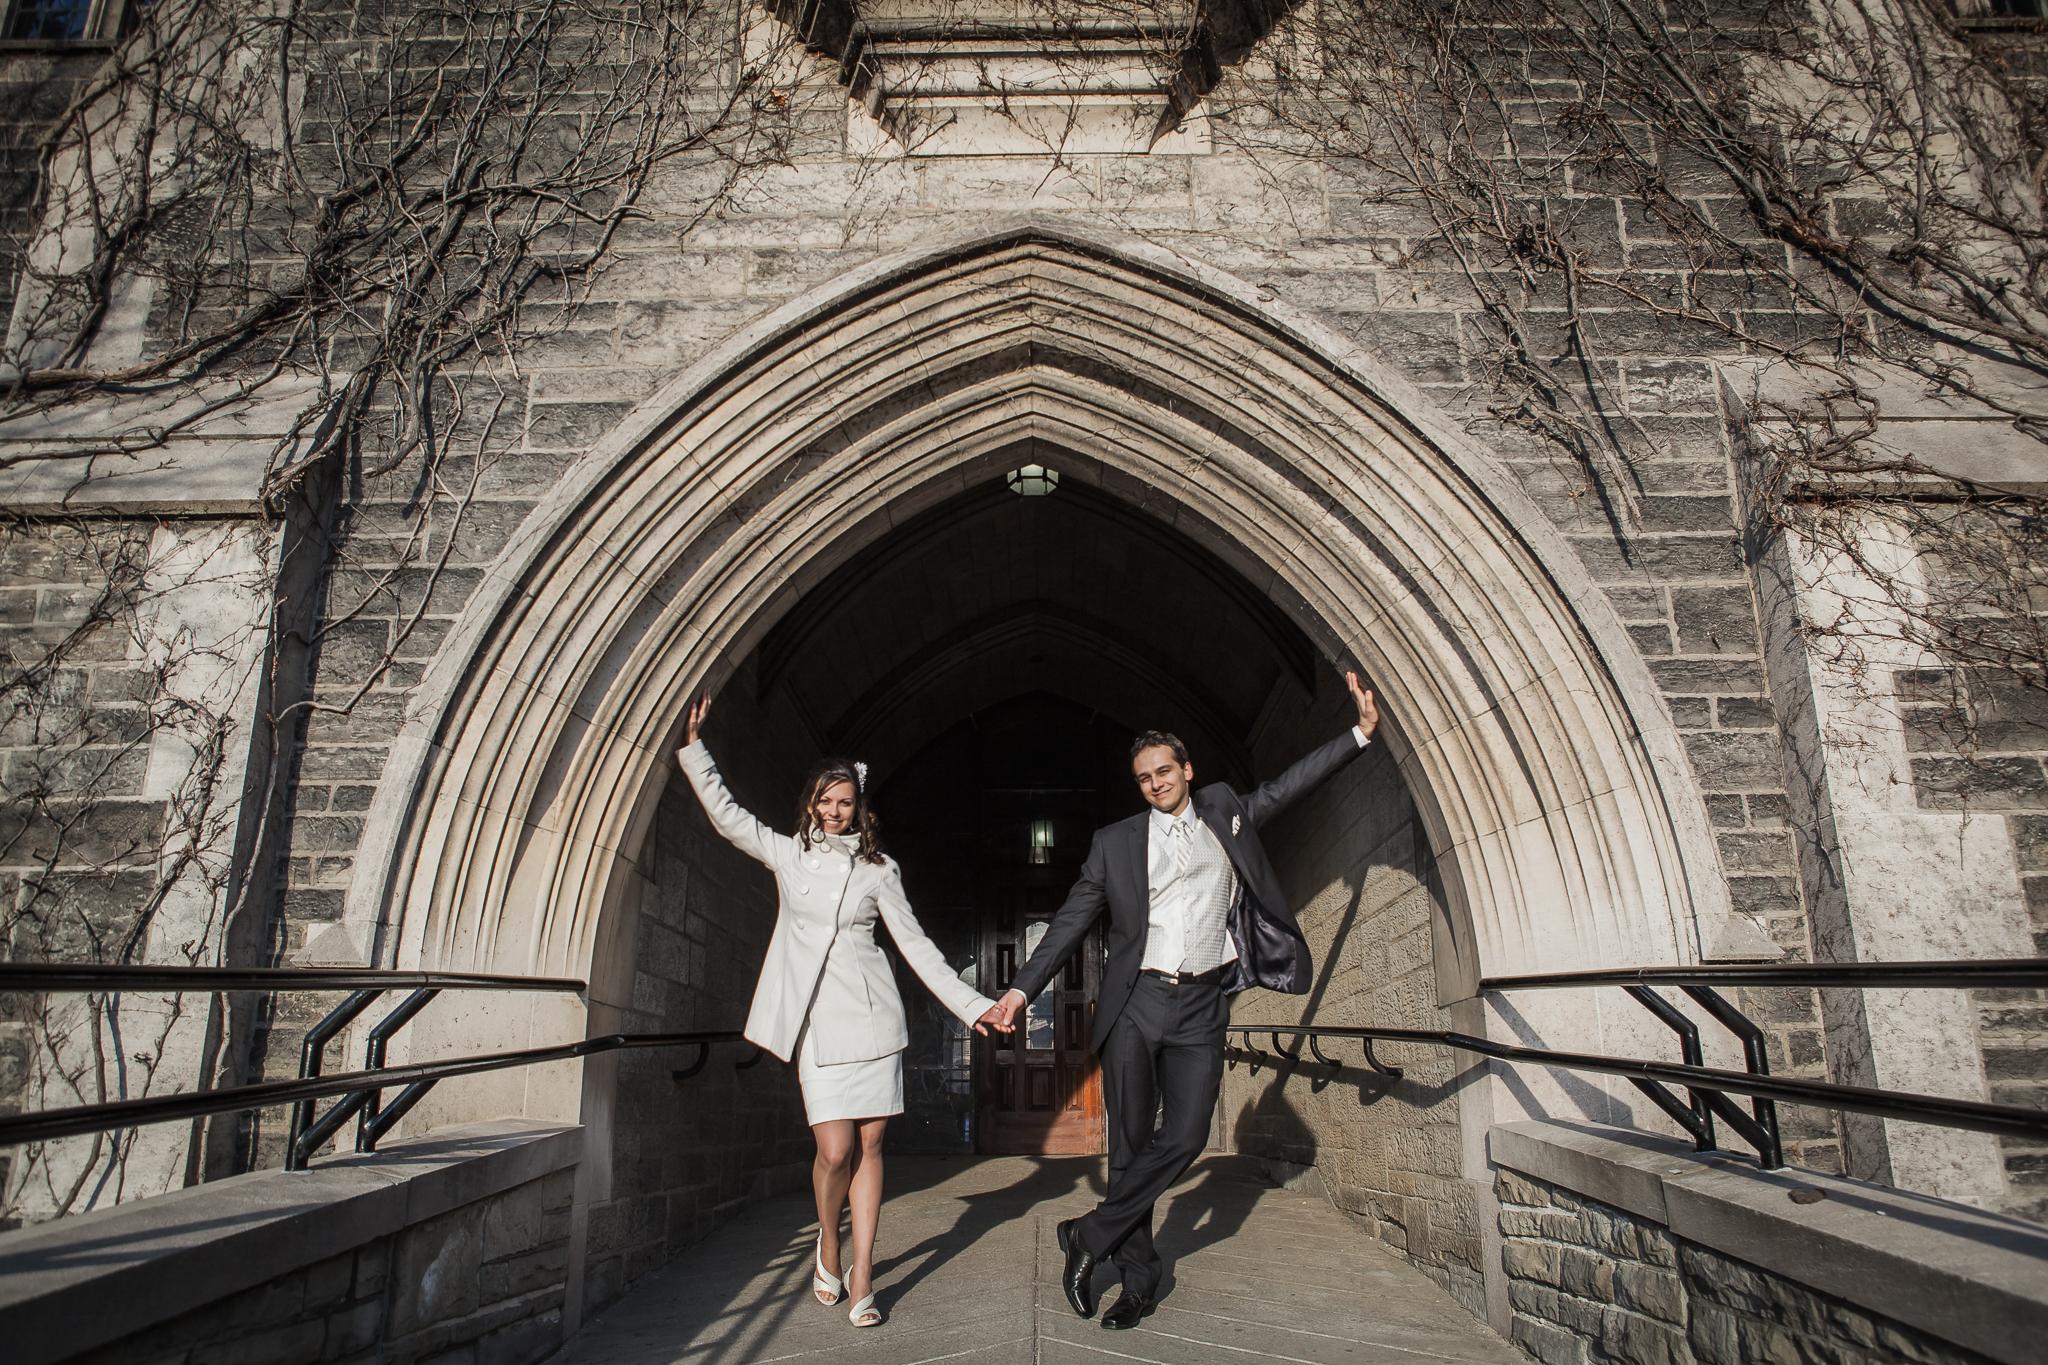 Toronto Wedding Photography - Zoya & Alexei -38.jpg